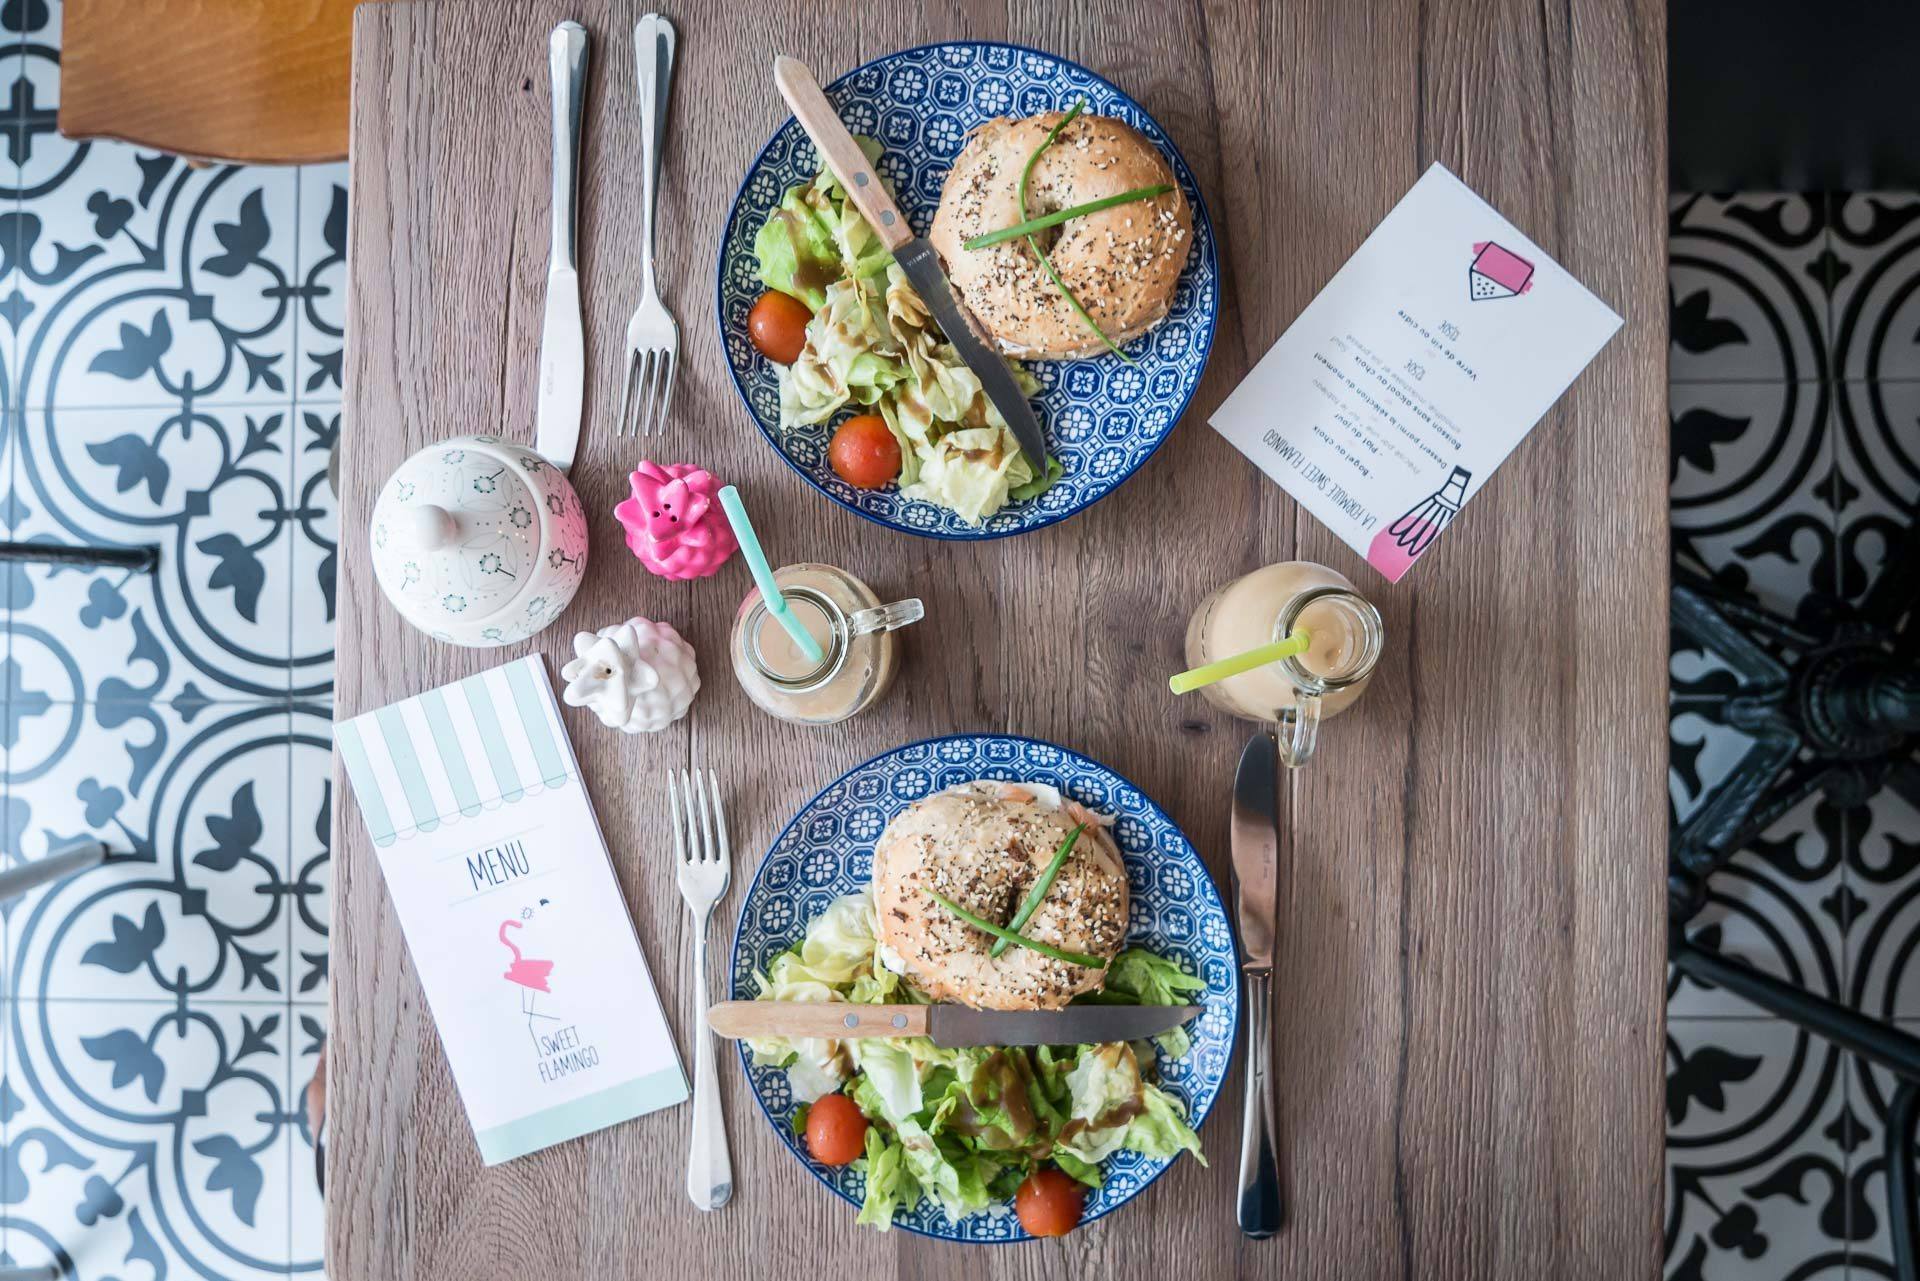 Pink Flamingo Lille Café Tipp-3